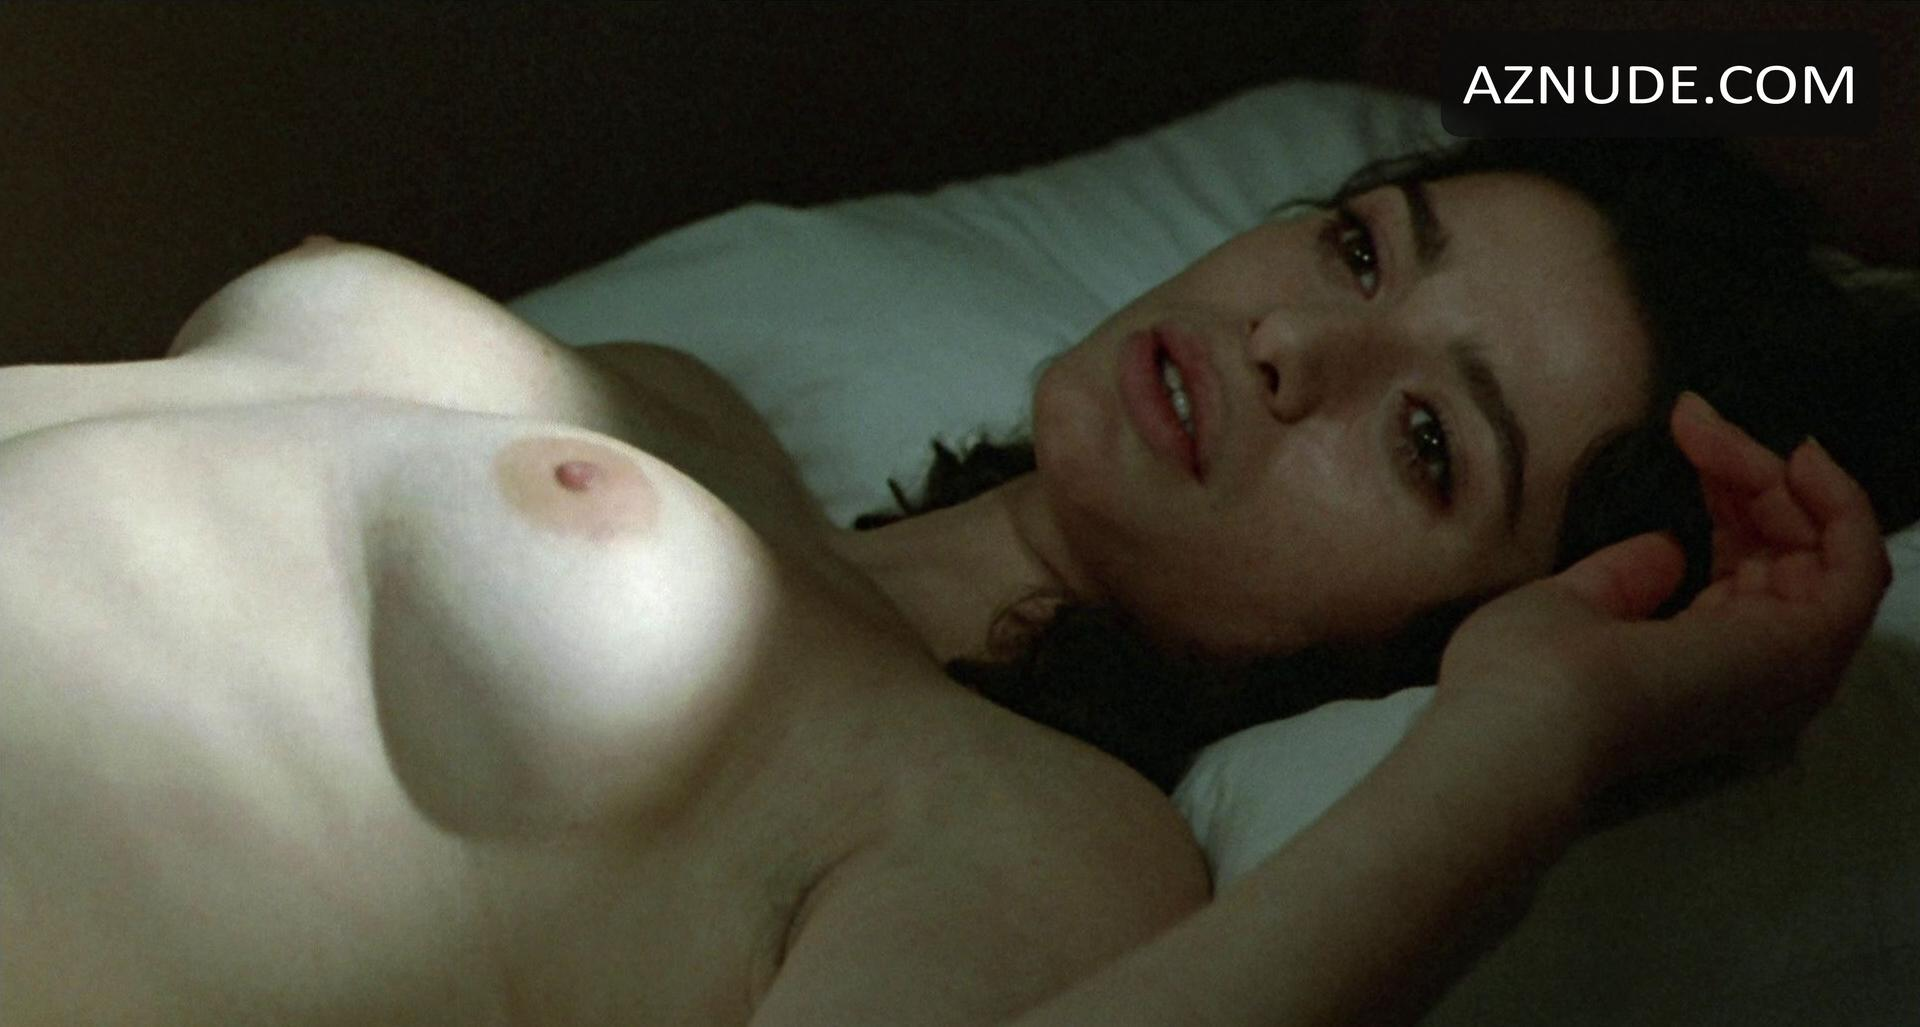 Naked women prison movies